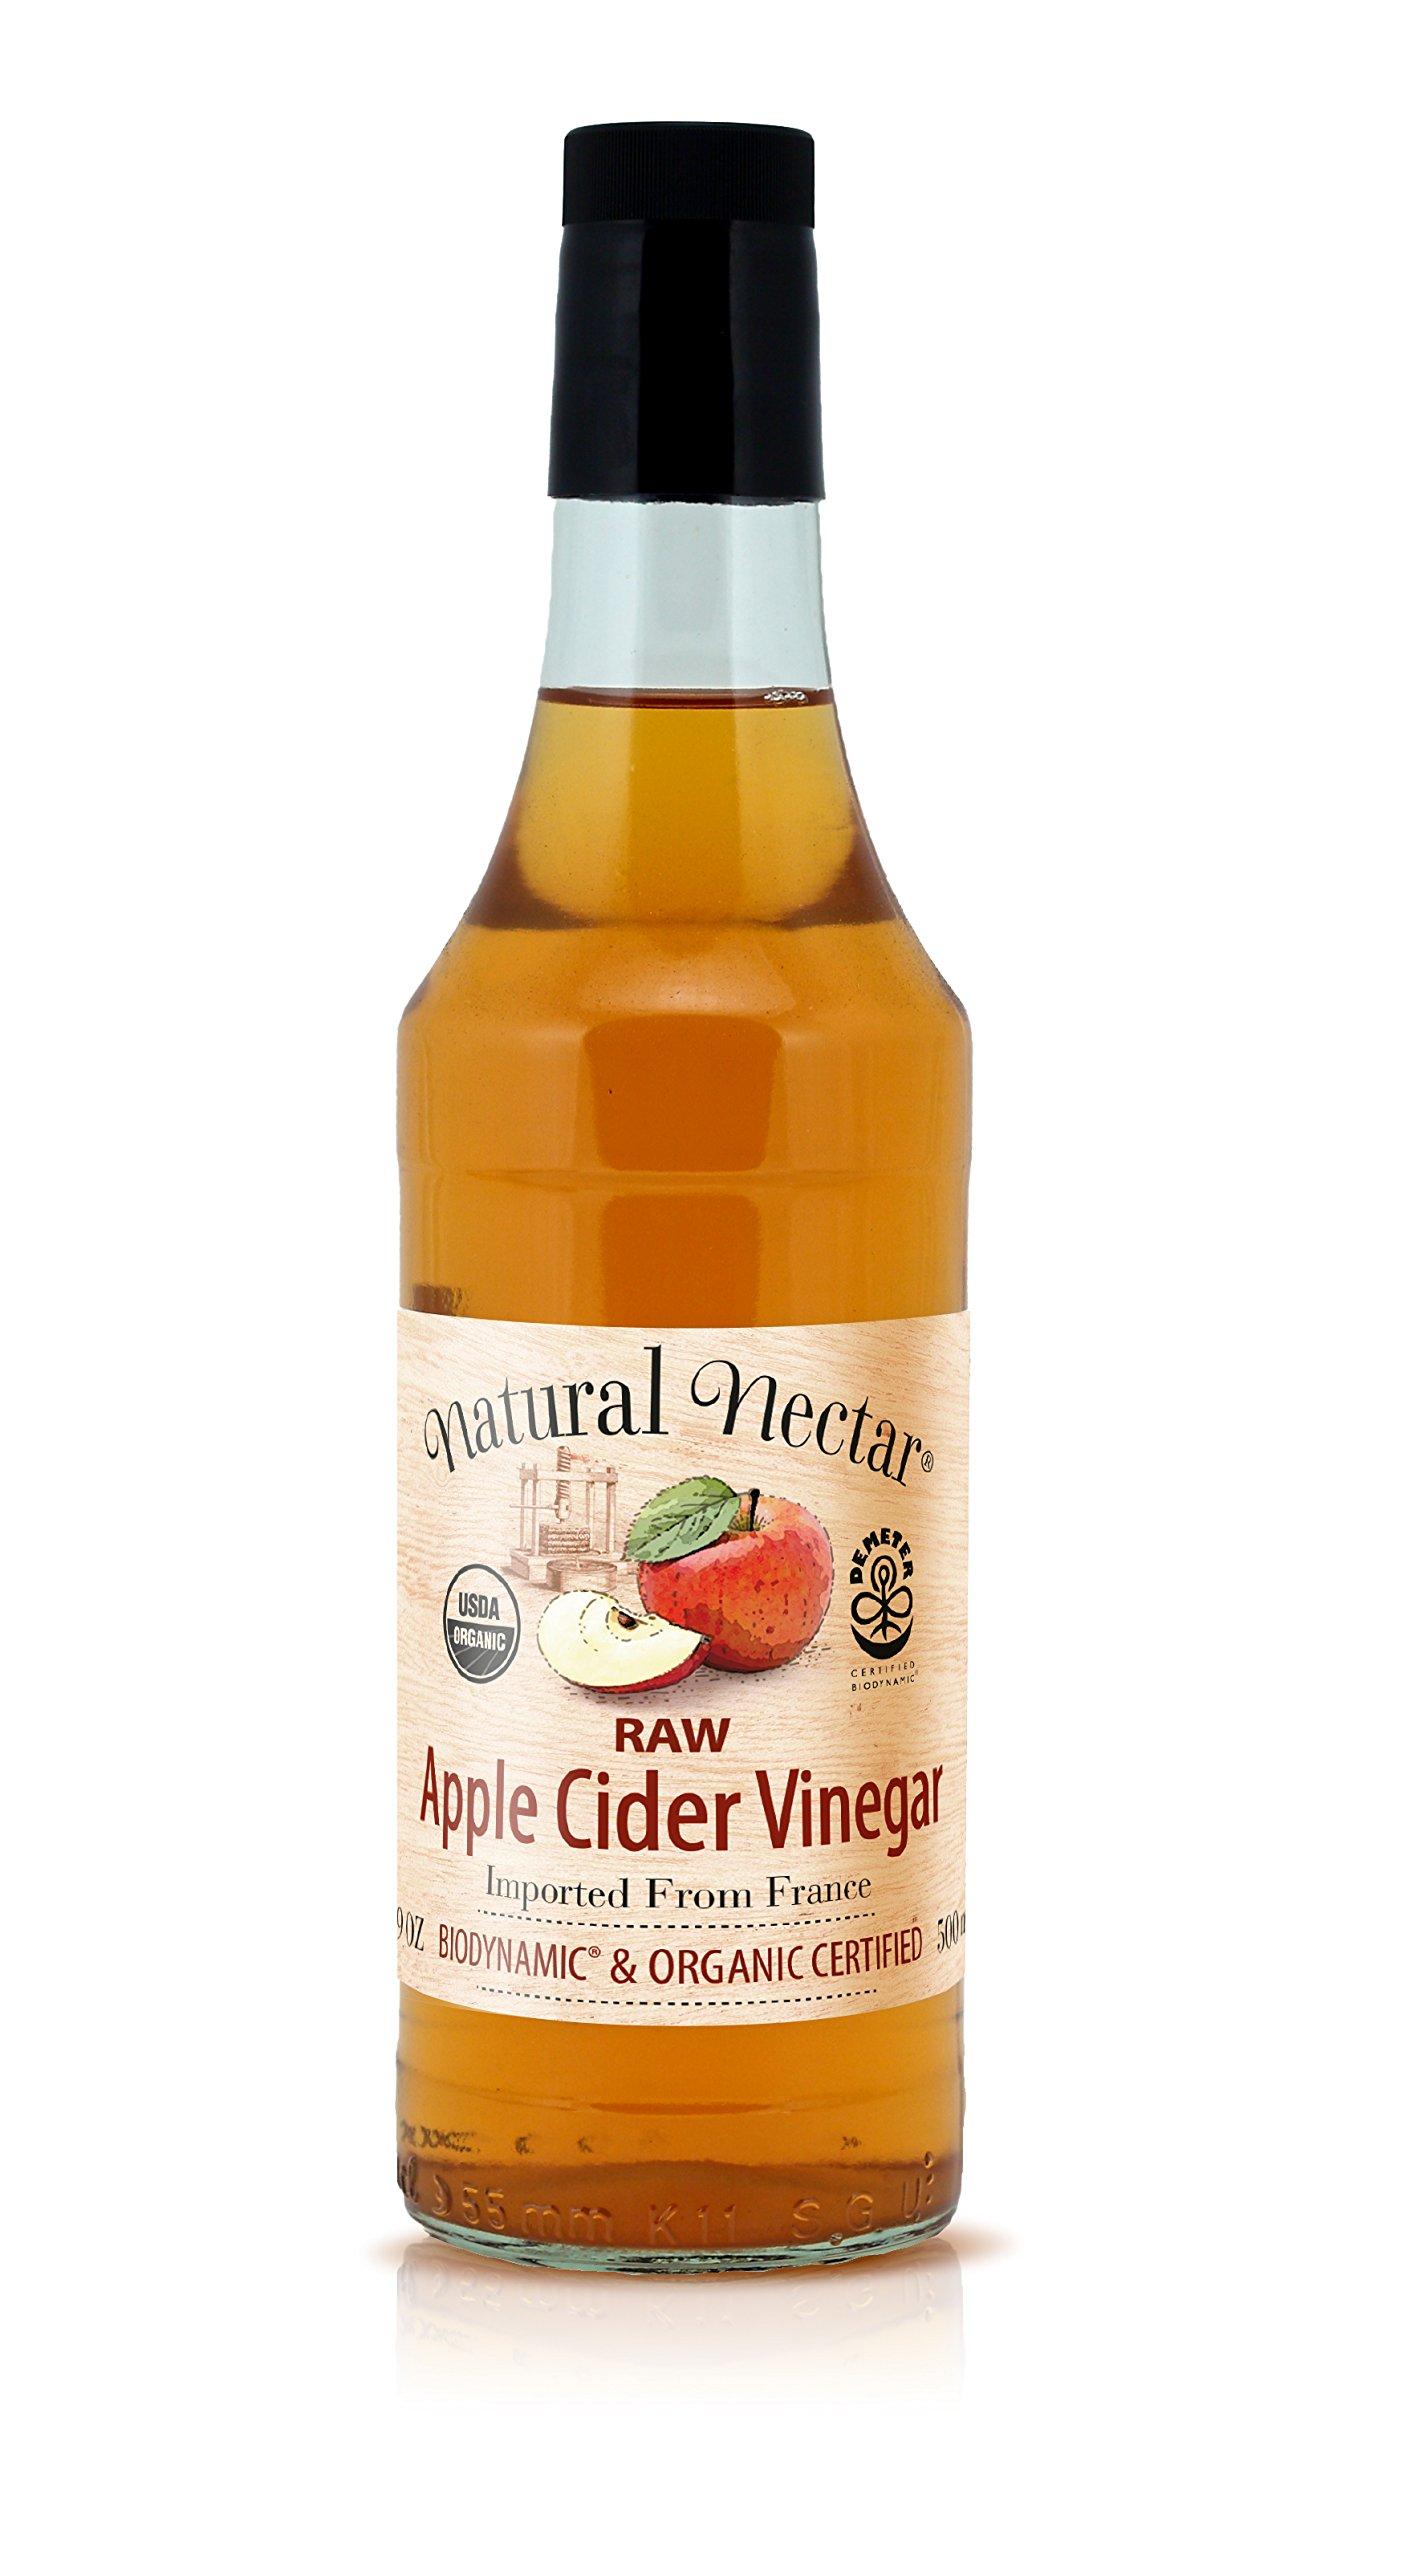 Natural Nectar Demeter Usda Organic & Biodynamic Raw Apple Cider Vinegar, 16.9 Ounce (Pack of 6)